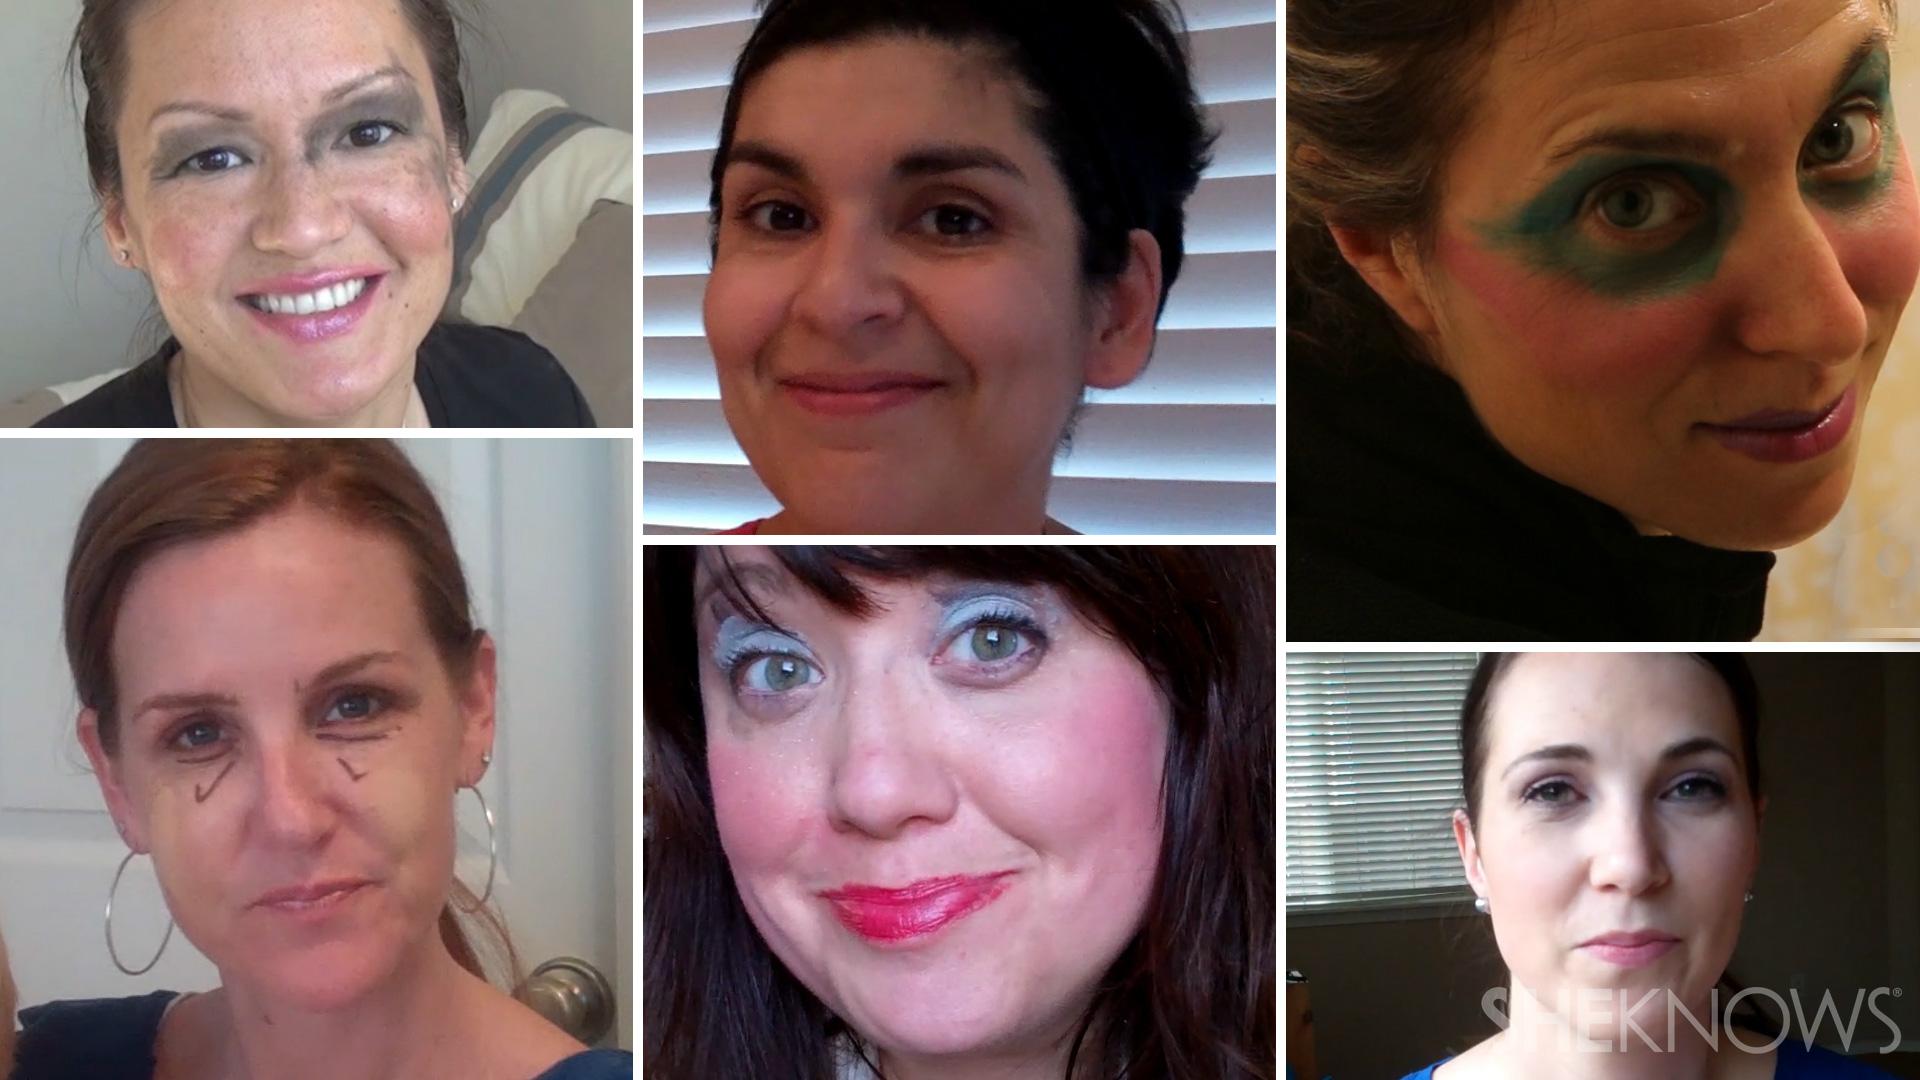 Moms turn makeup duties over to husbands, kids